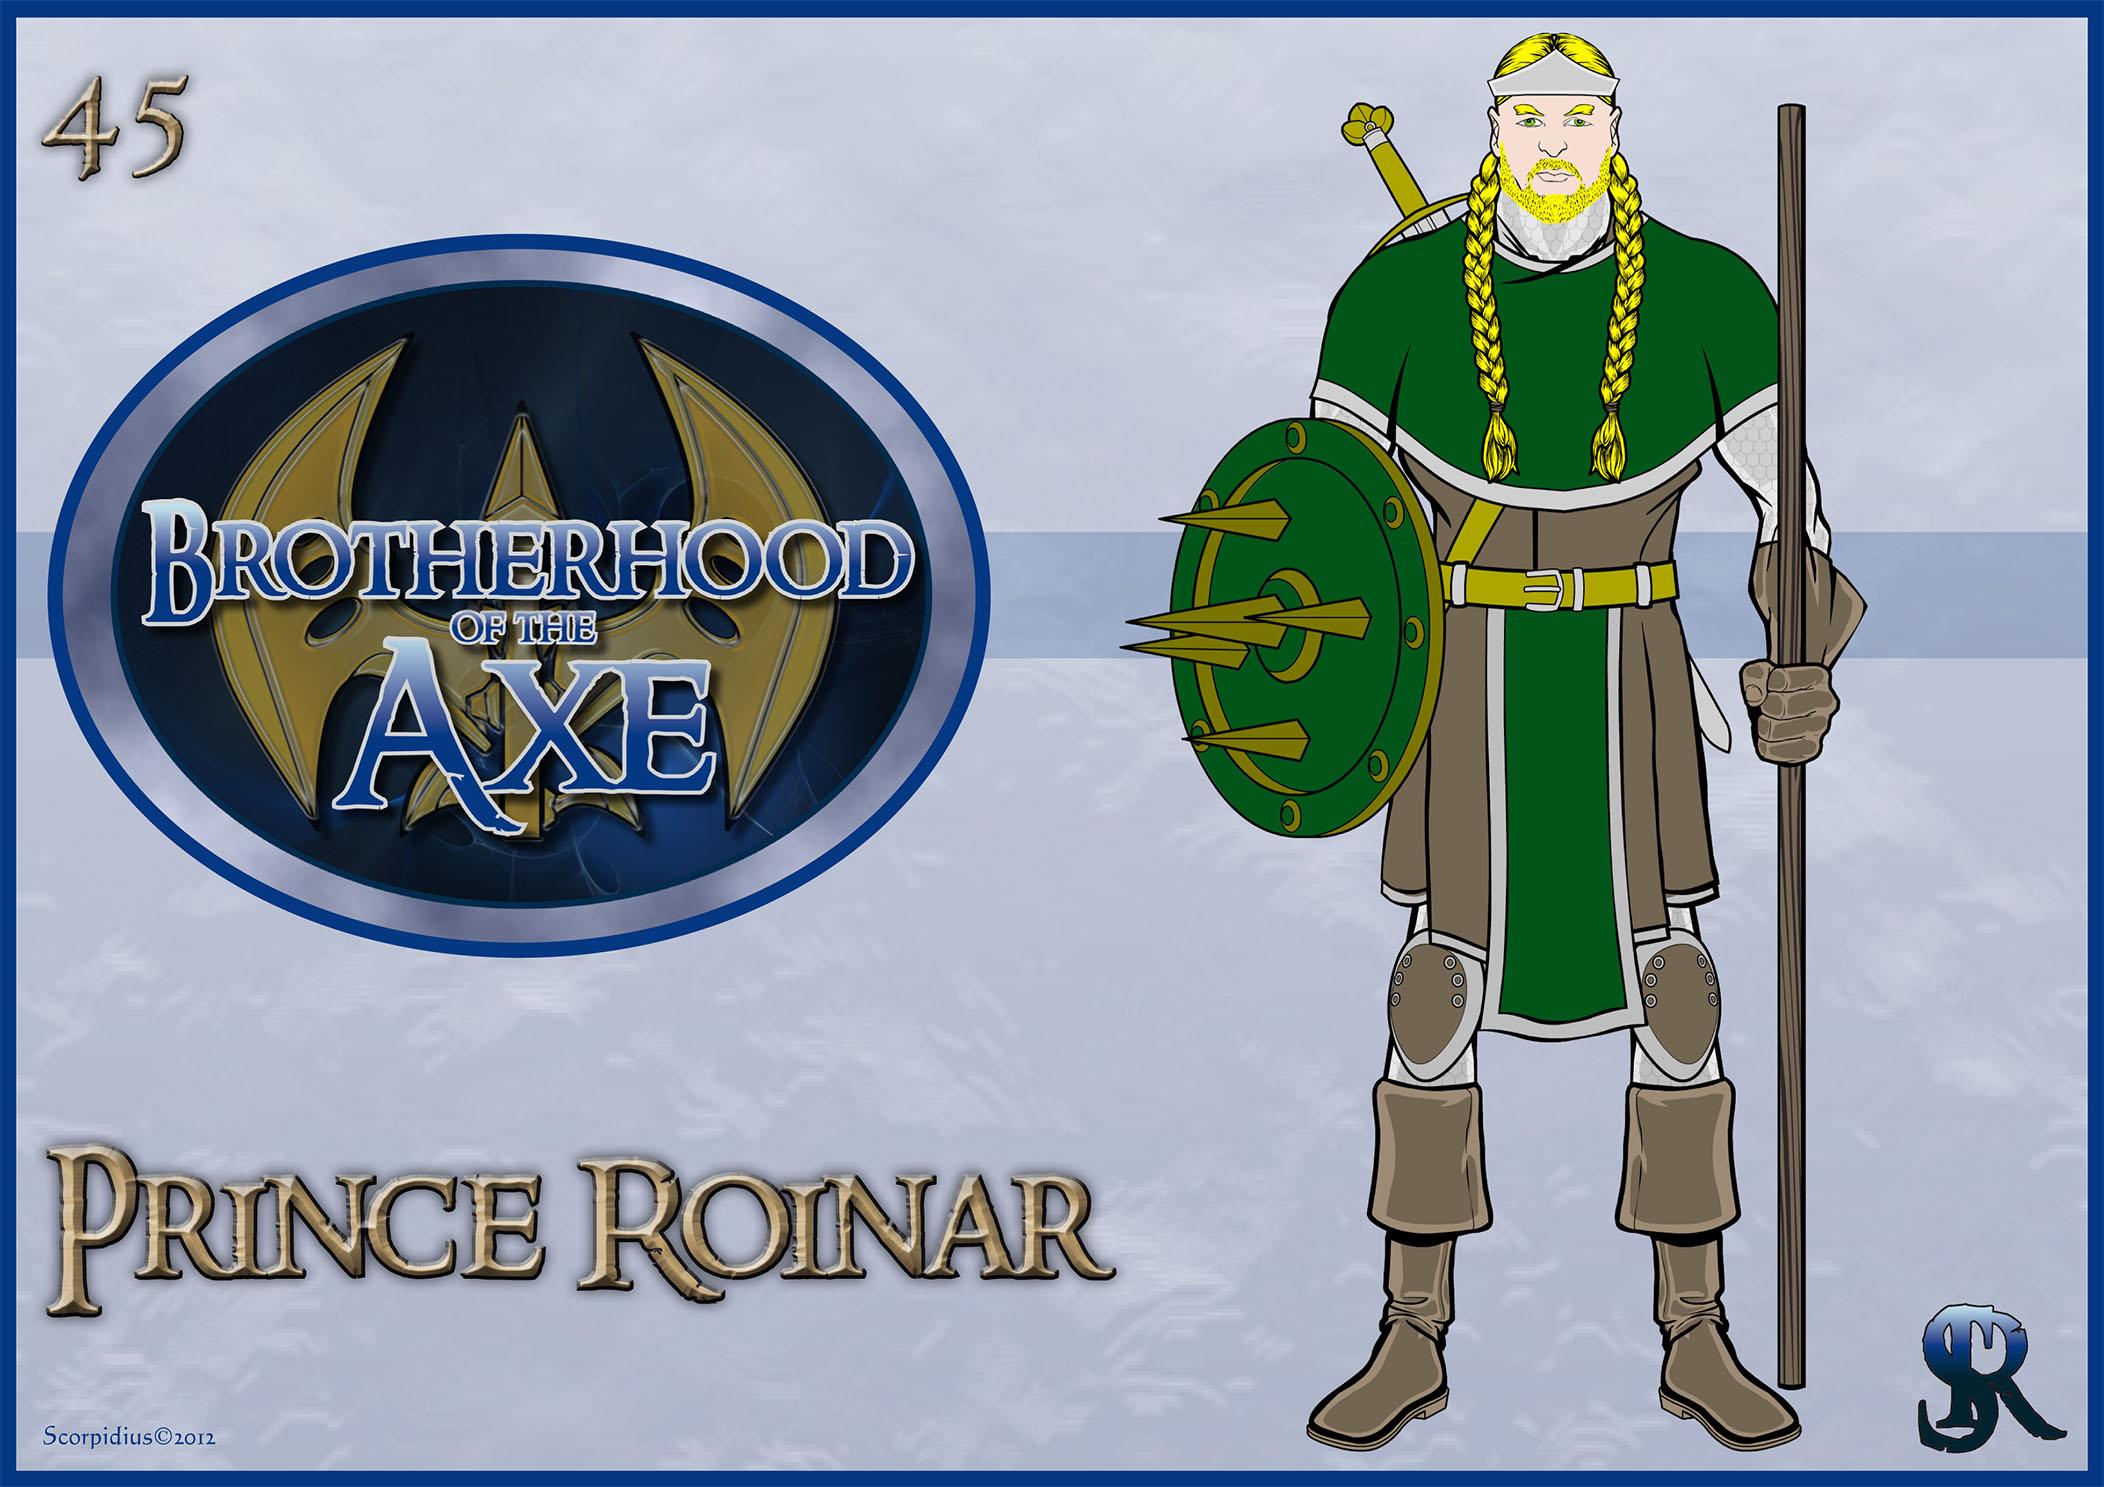 http://www.heromachine.com/wp-content/legacy/forum-image-uploads/scorpidius/2012/03/045-Prince-Roinar-1.jpg